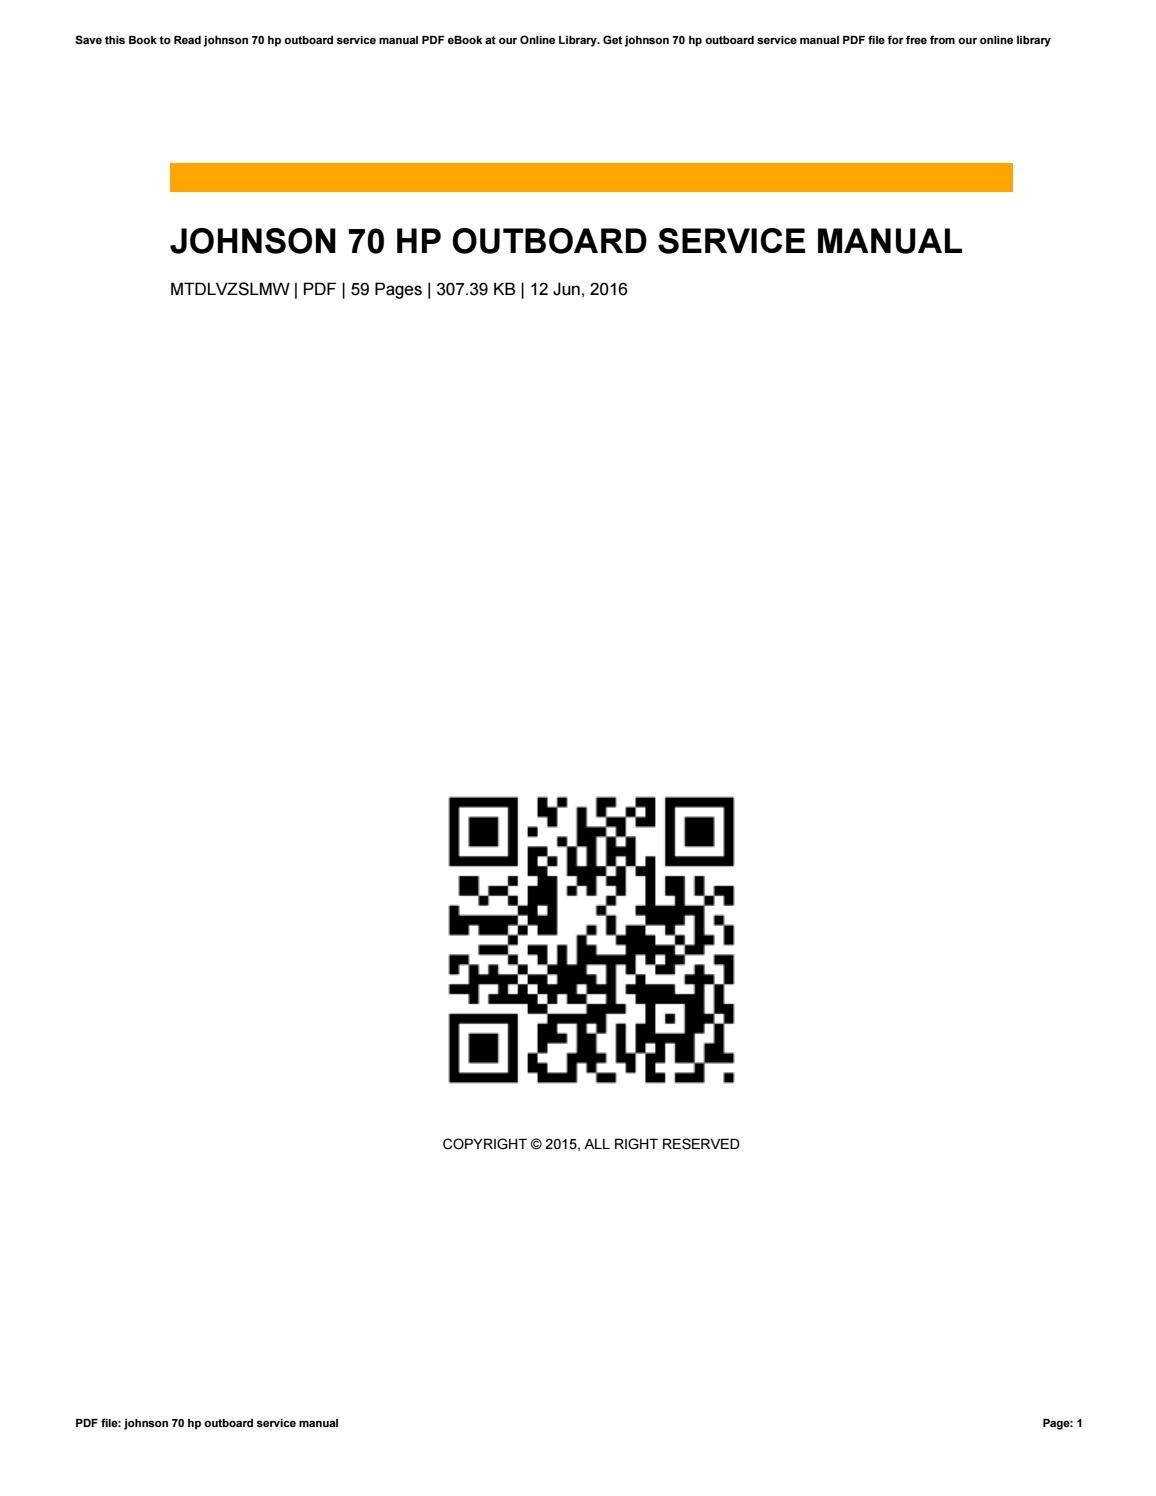 Johnson 20 hk manual ebook array manual johnson 70 hp rh manual johnson 70 hp dohbots de fandeluxe Choice Image